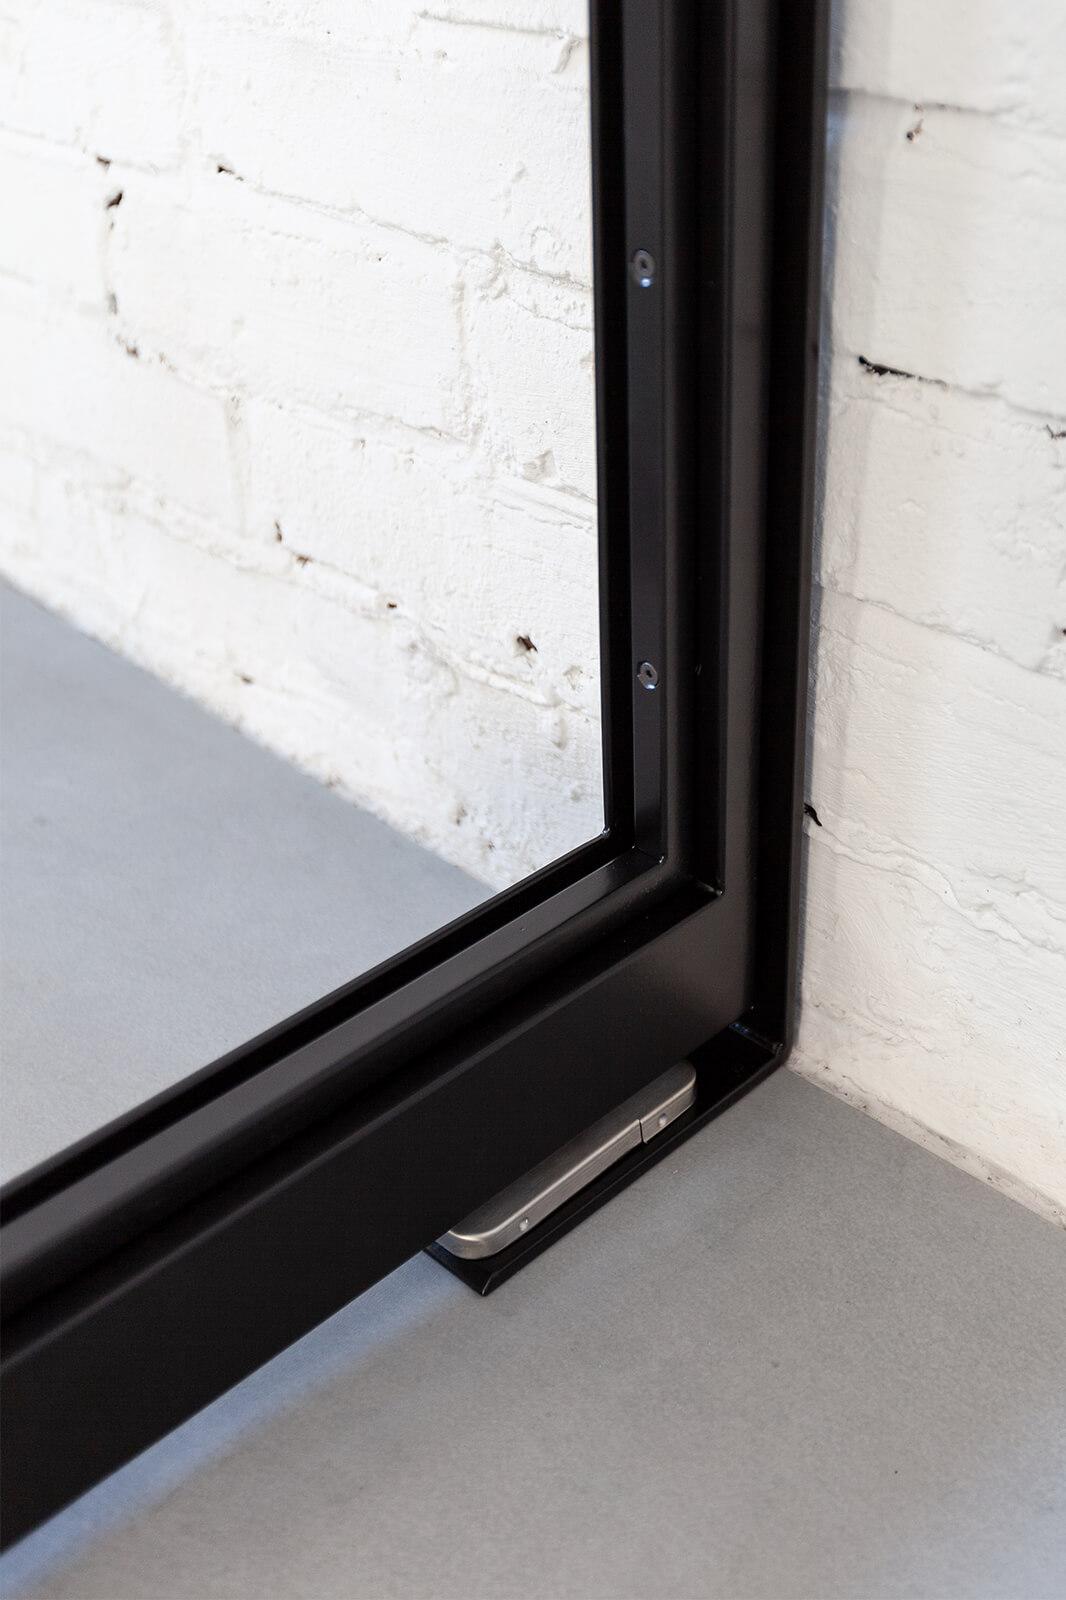 Loft Stahl, Loftstahl, N51E12, Stahl Loft Tür, Pivot, Schwingtür, Pivottür, Pivottür Aufnahme, Designtür